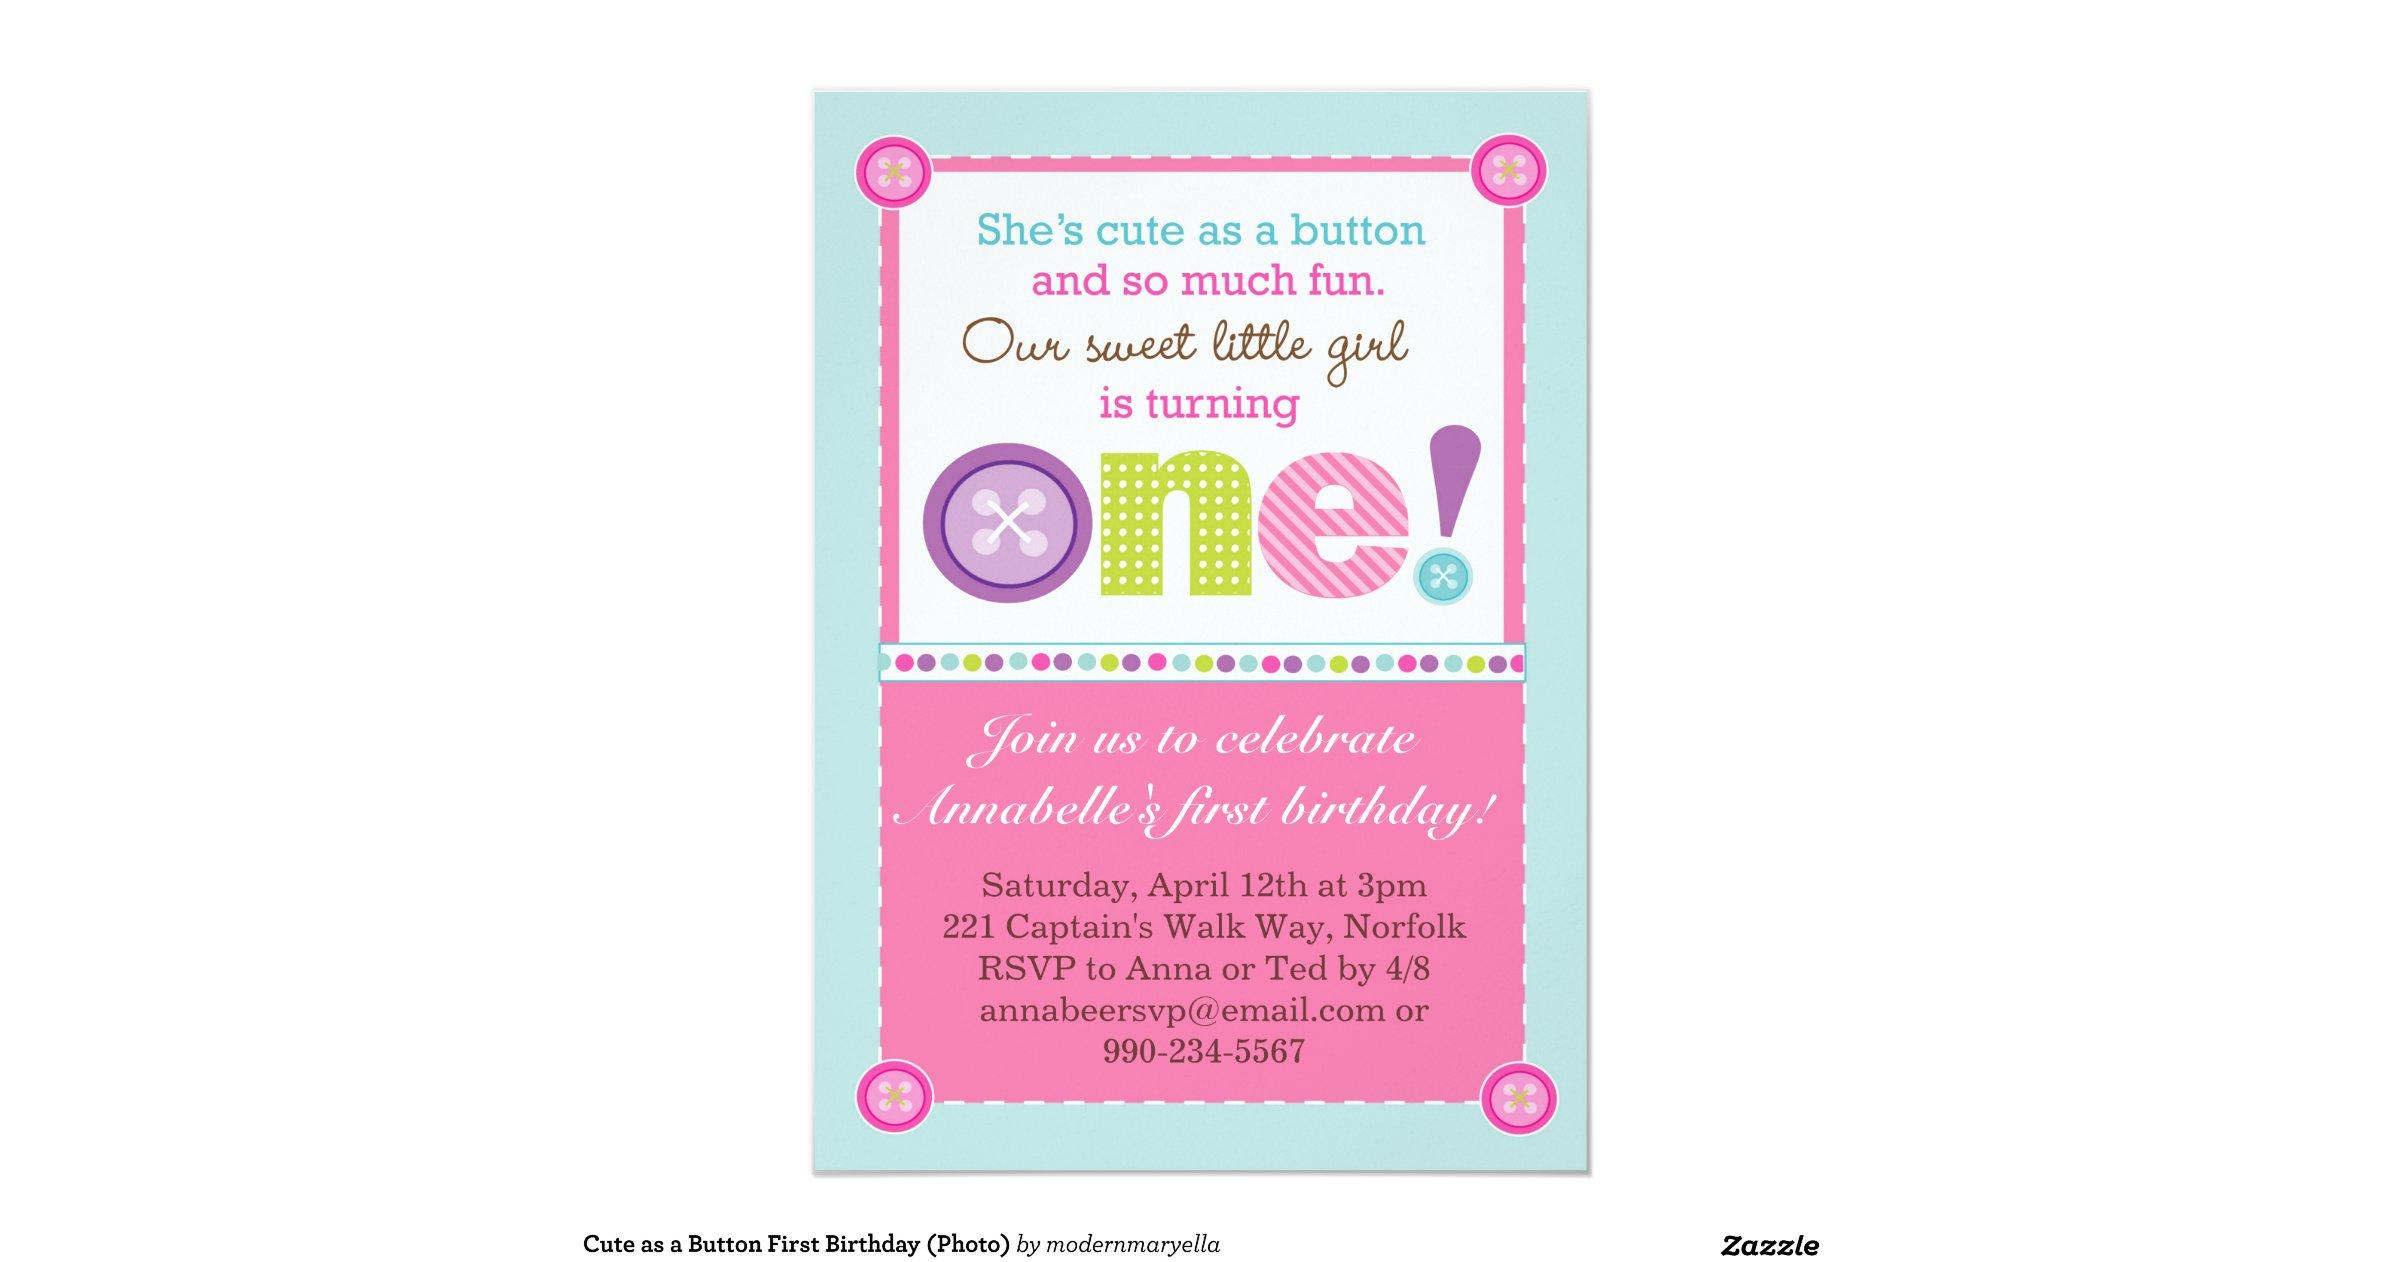 as a button 1st birthday invitations zazzle - birthday invitations ...